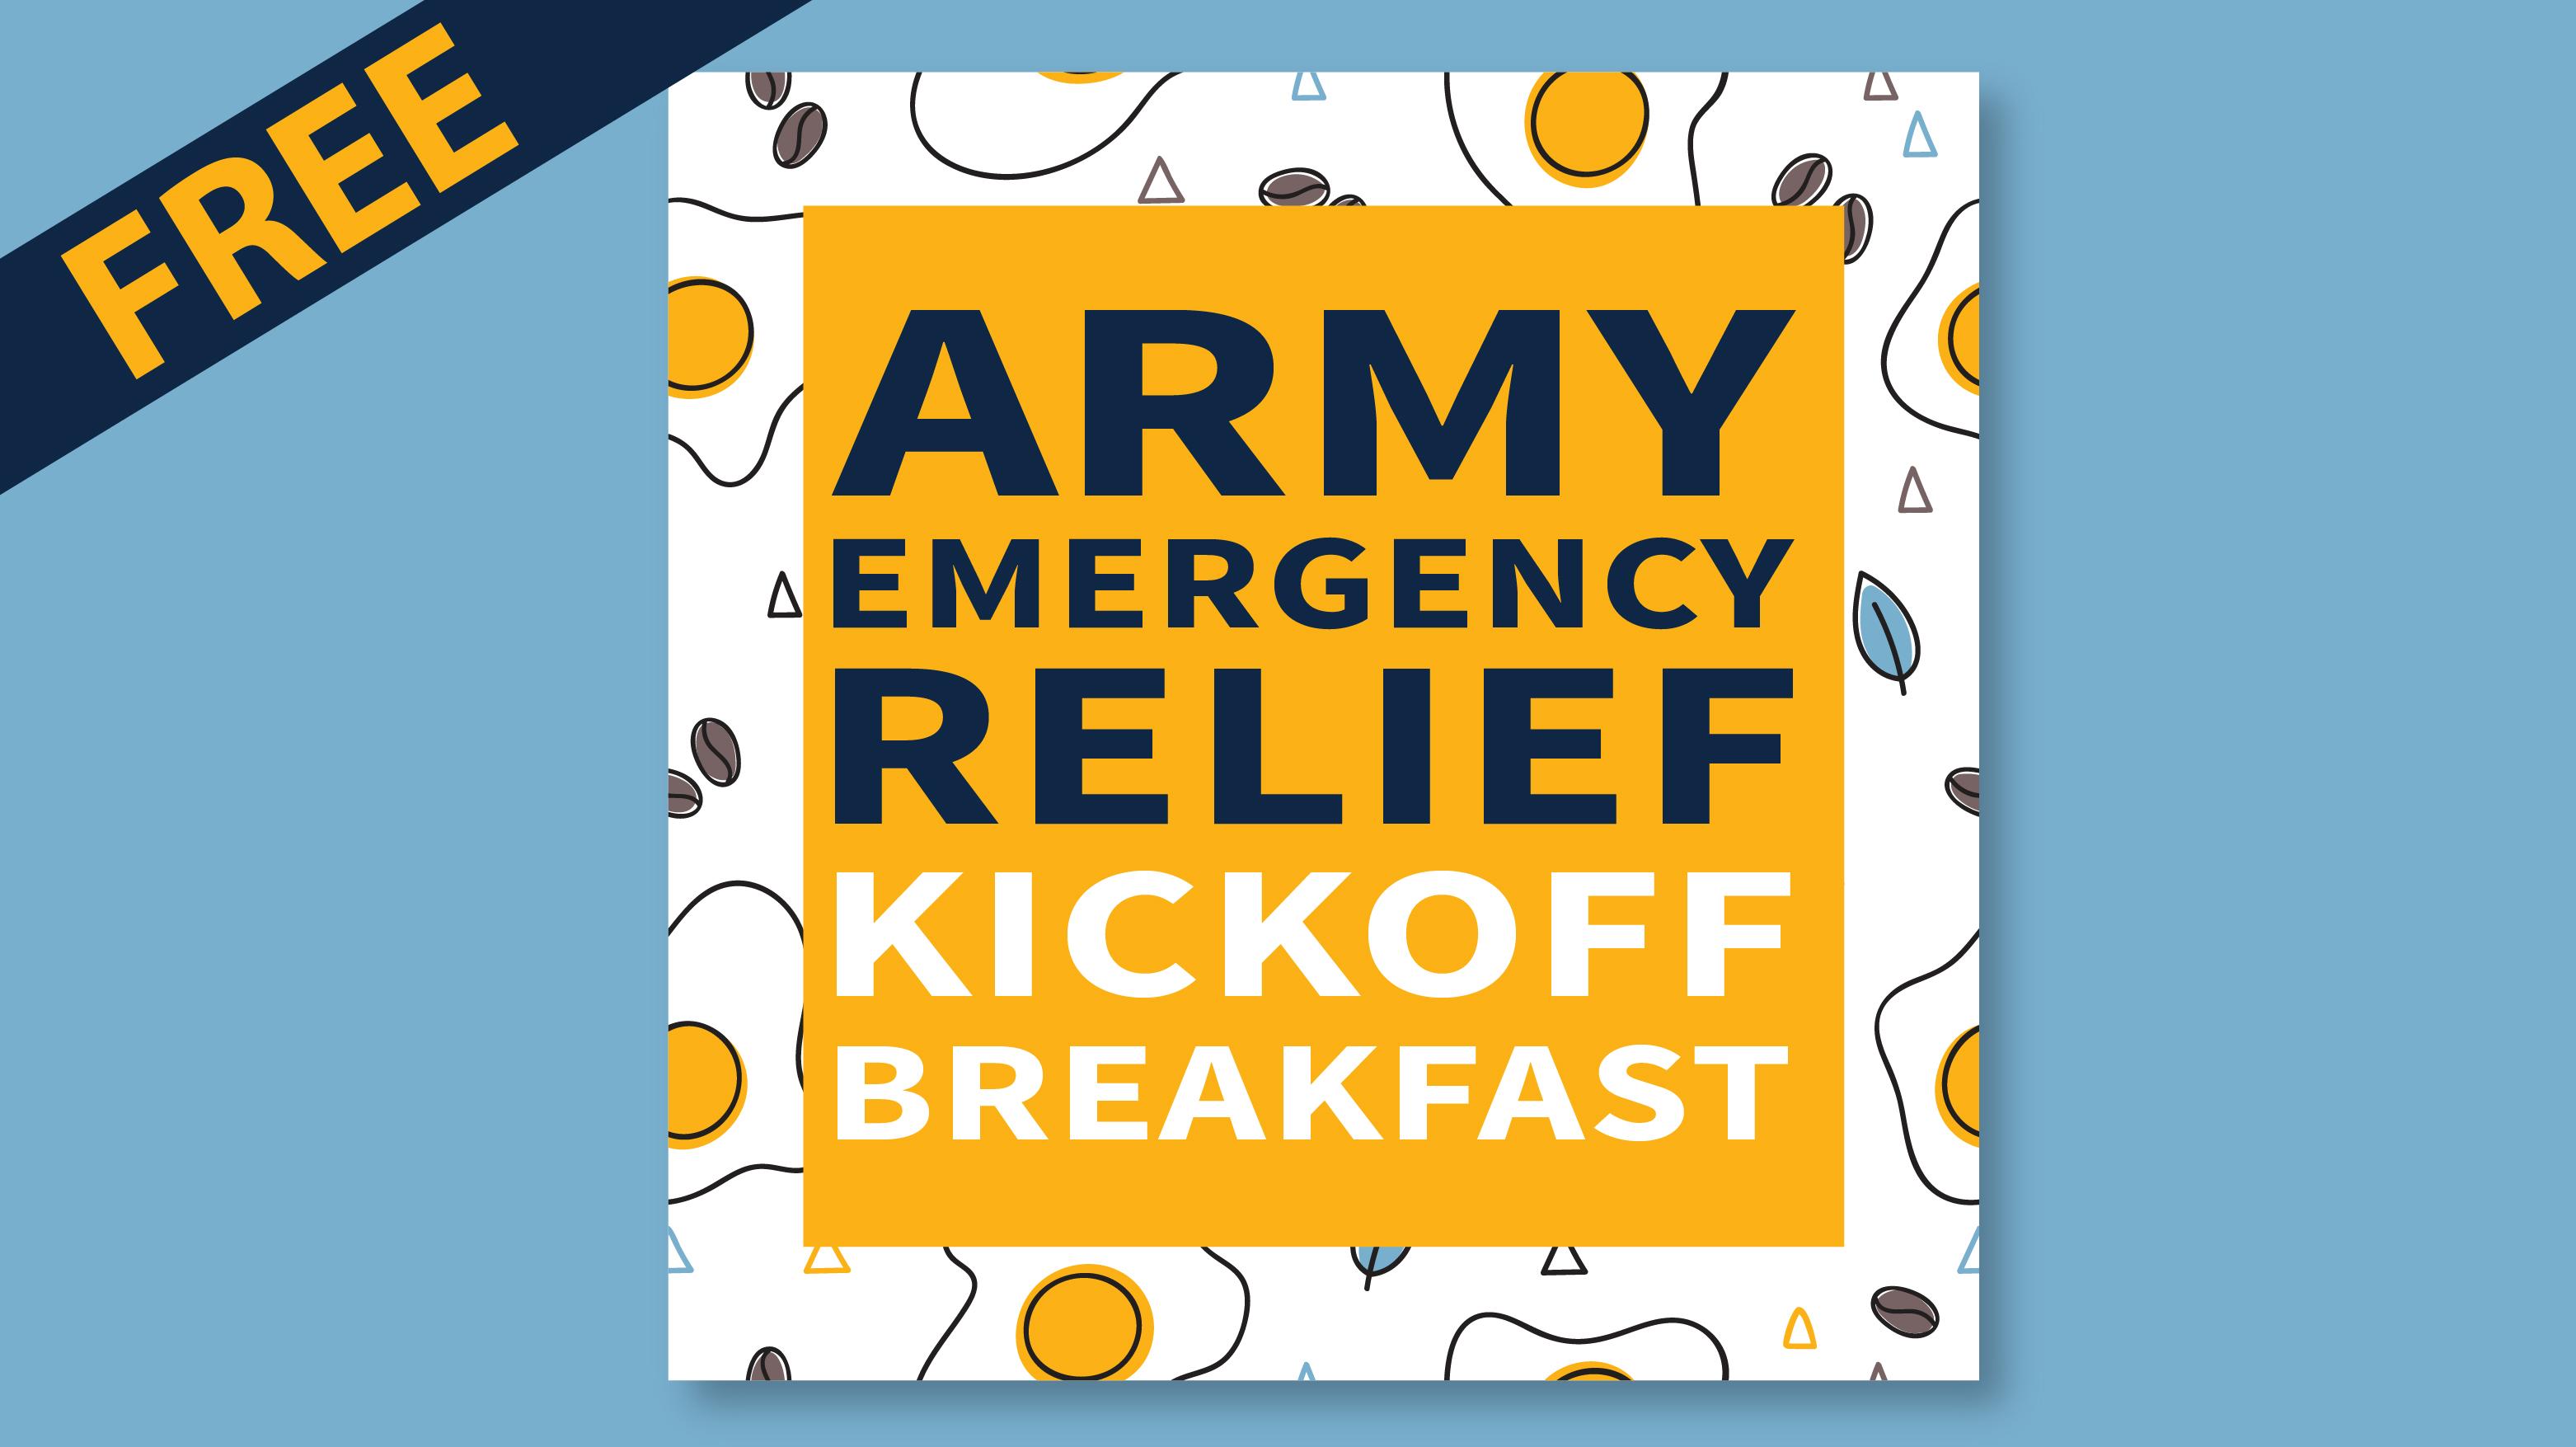 Army Emergency Relief Kick-off Breakfast